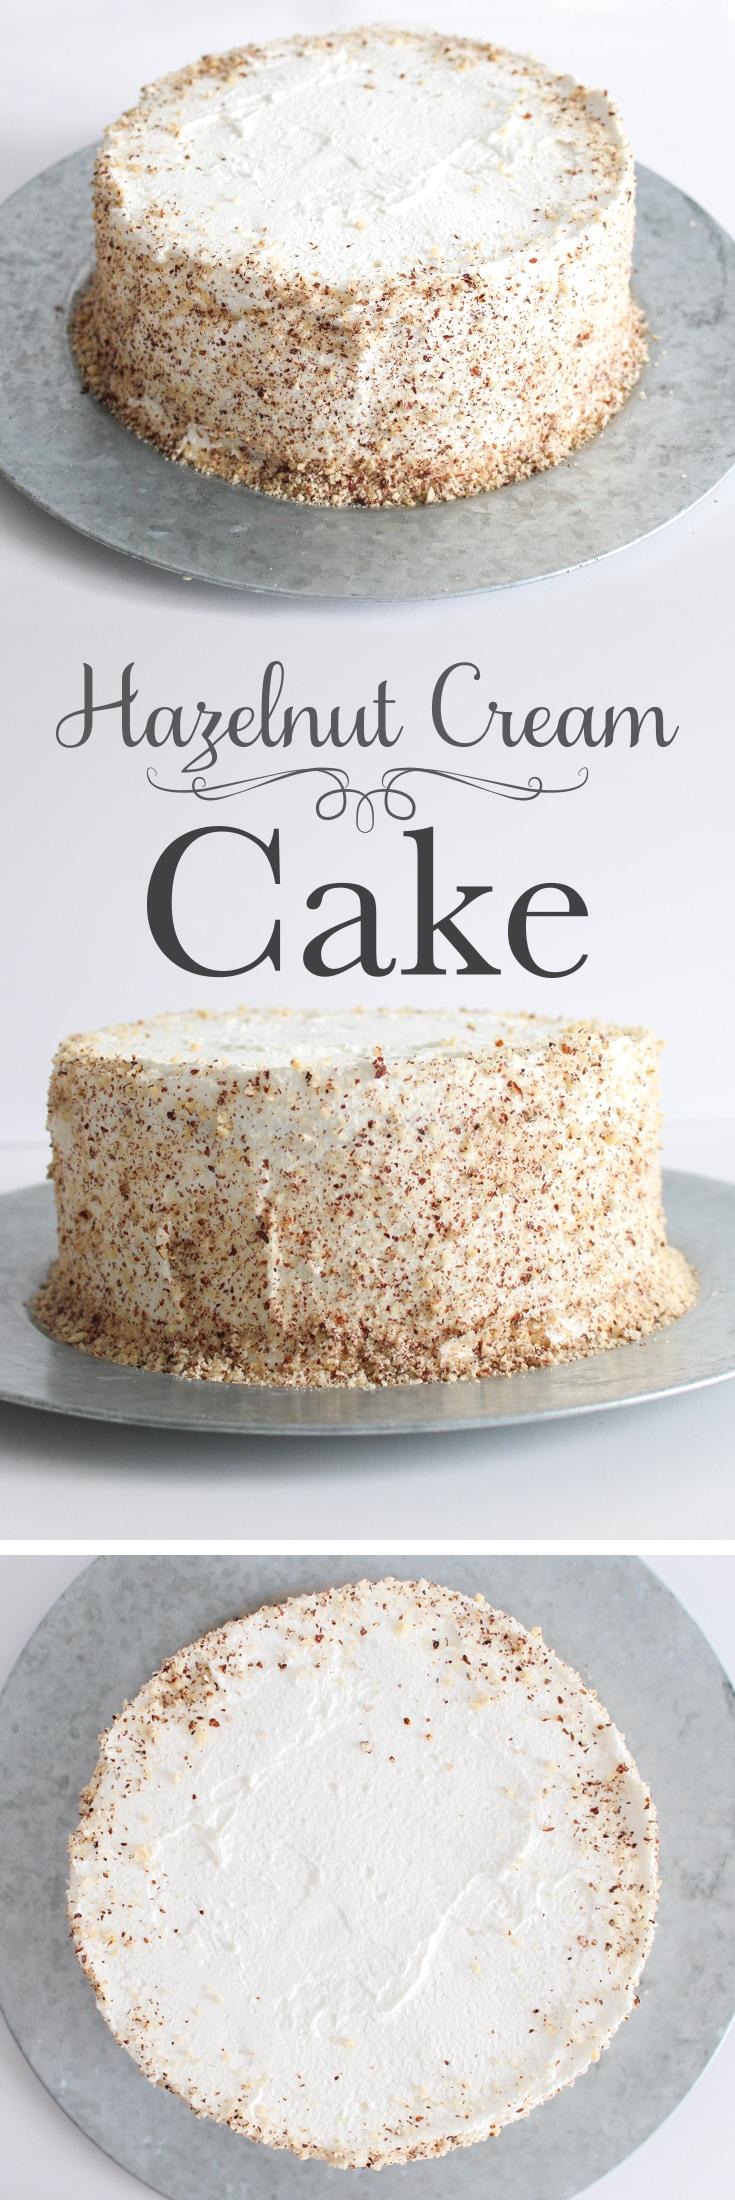 Box Carrot Cake Recipes